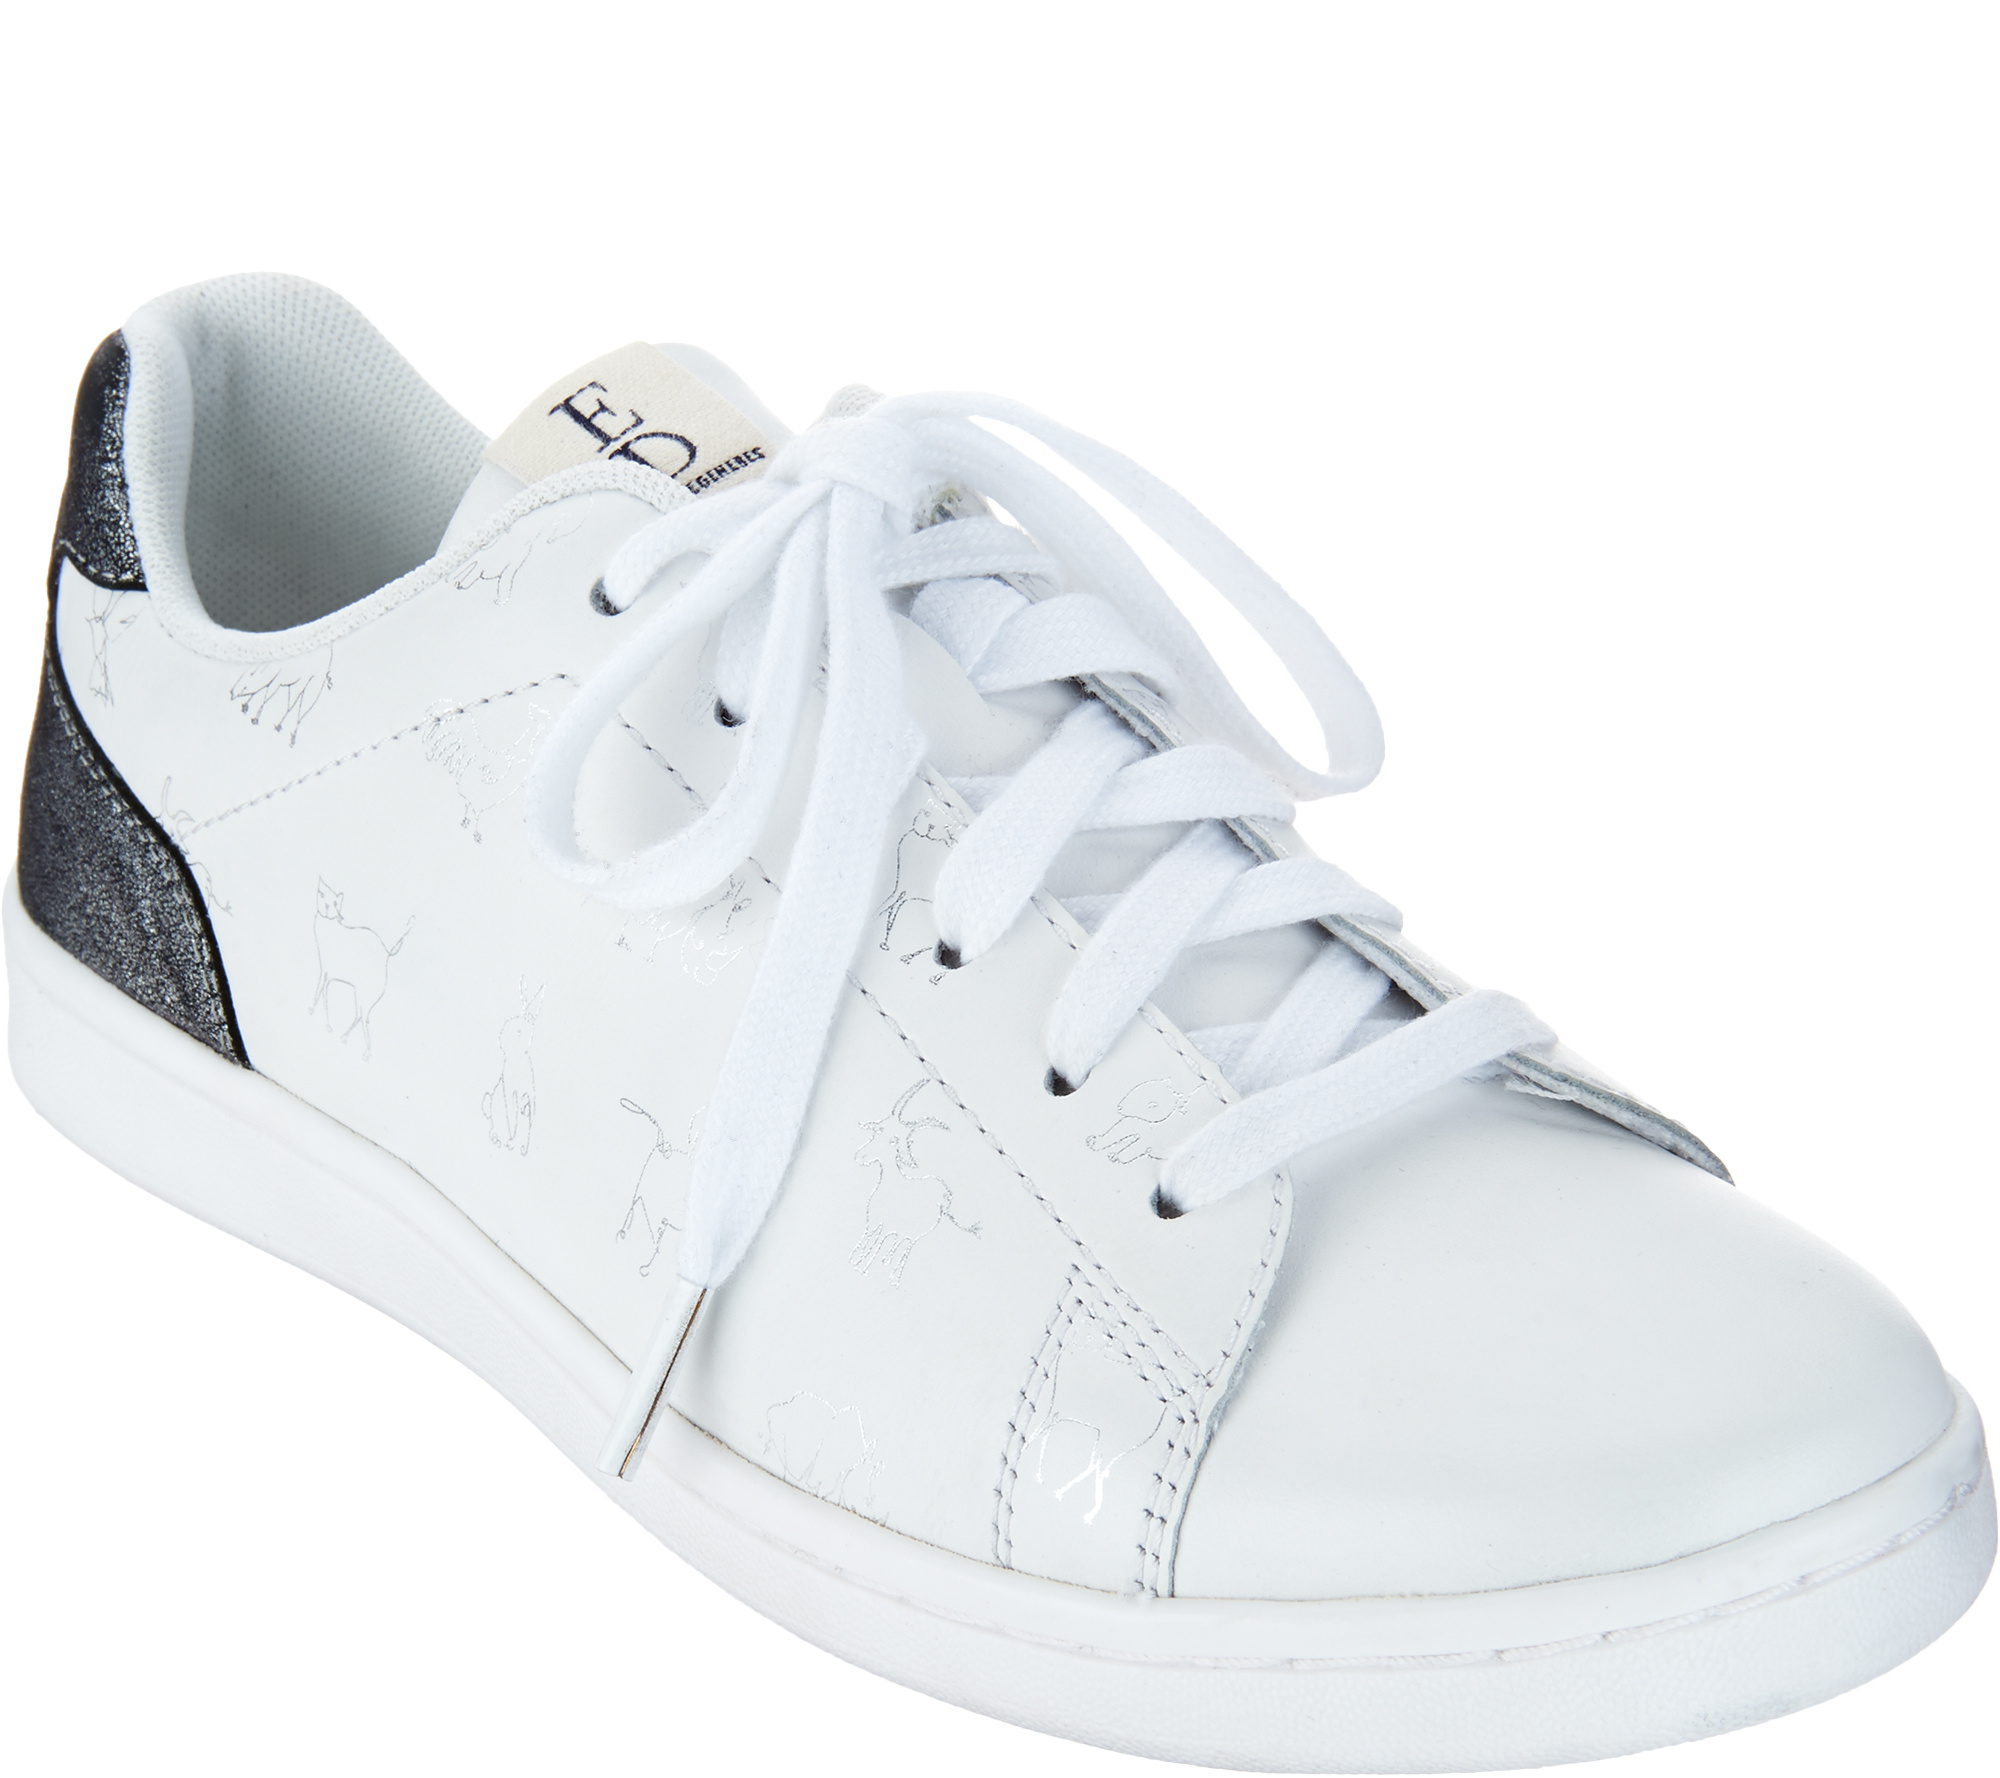 ED Ellen DeGeneres Printed Leather Sneakers - Chaboss